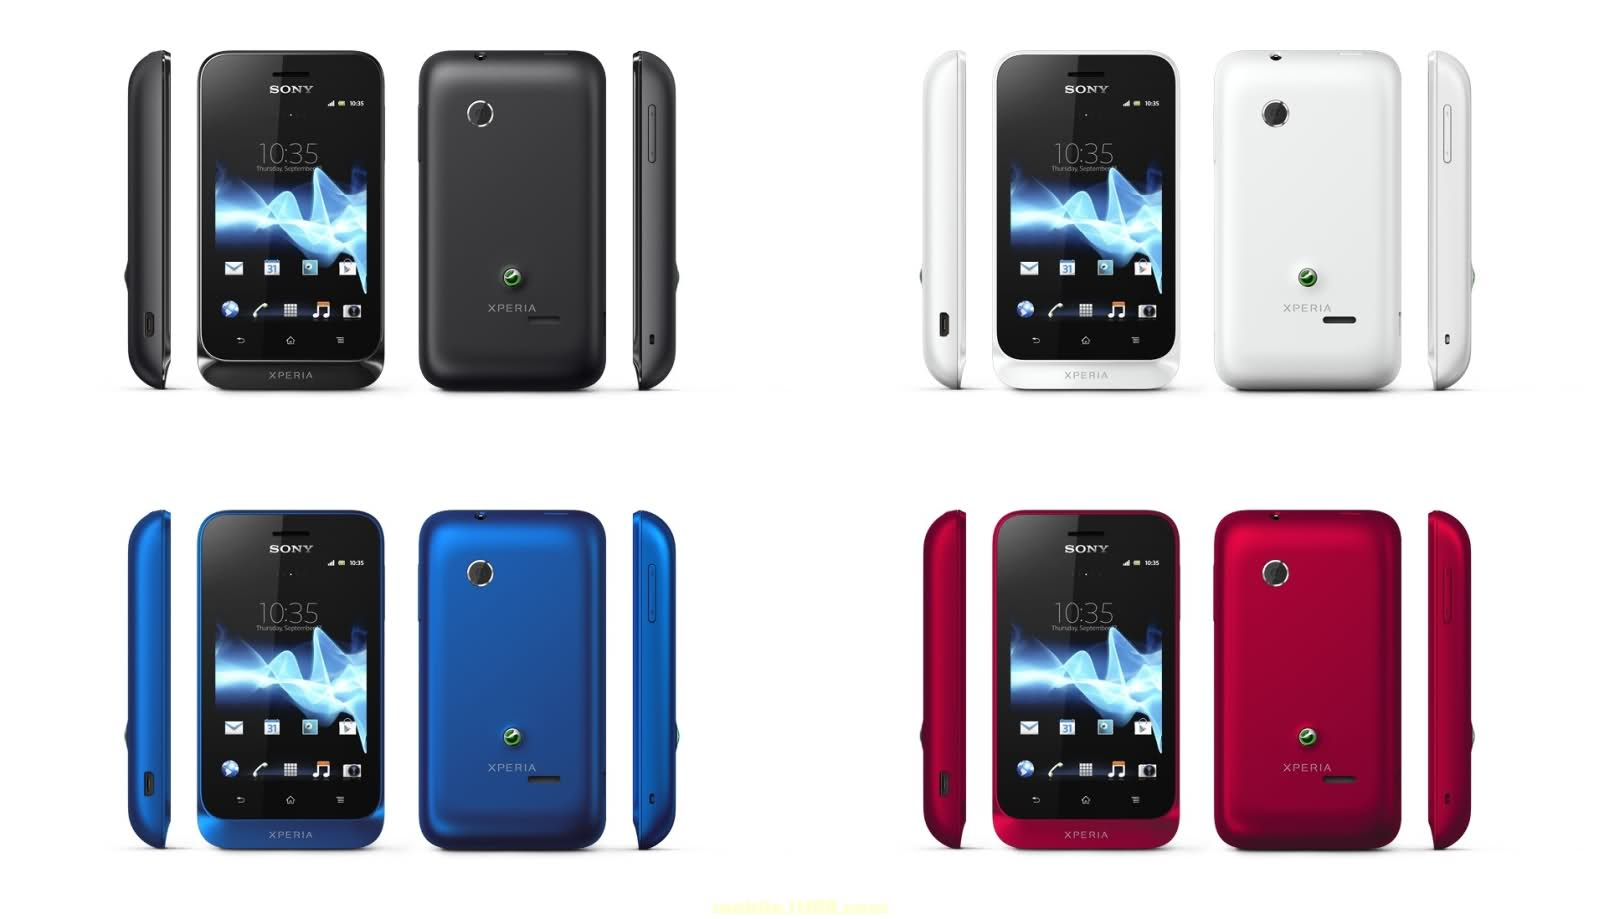 http://www.phonegg.com/Sony/Xperia-tipo-dual/Sony-Xperia-tipo-dual-1.jpg